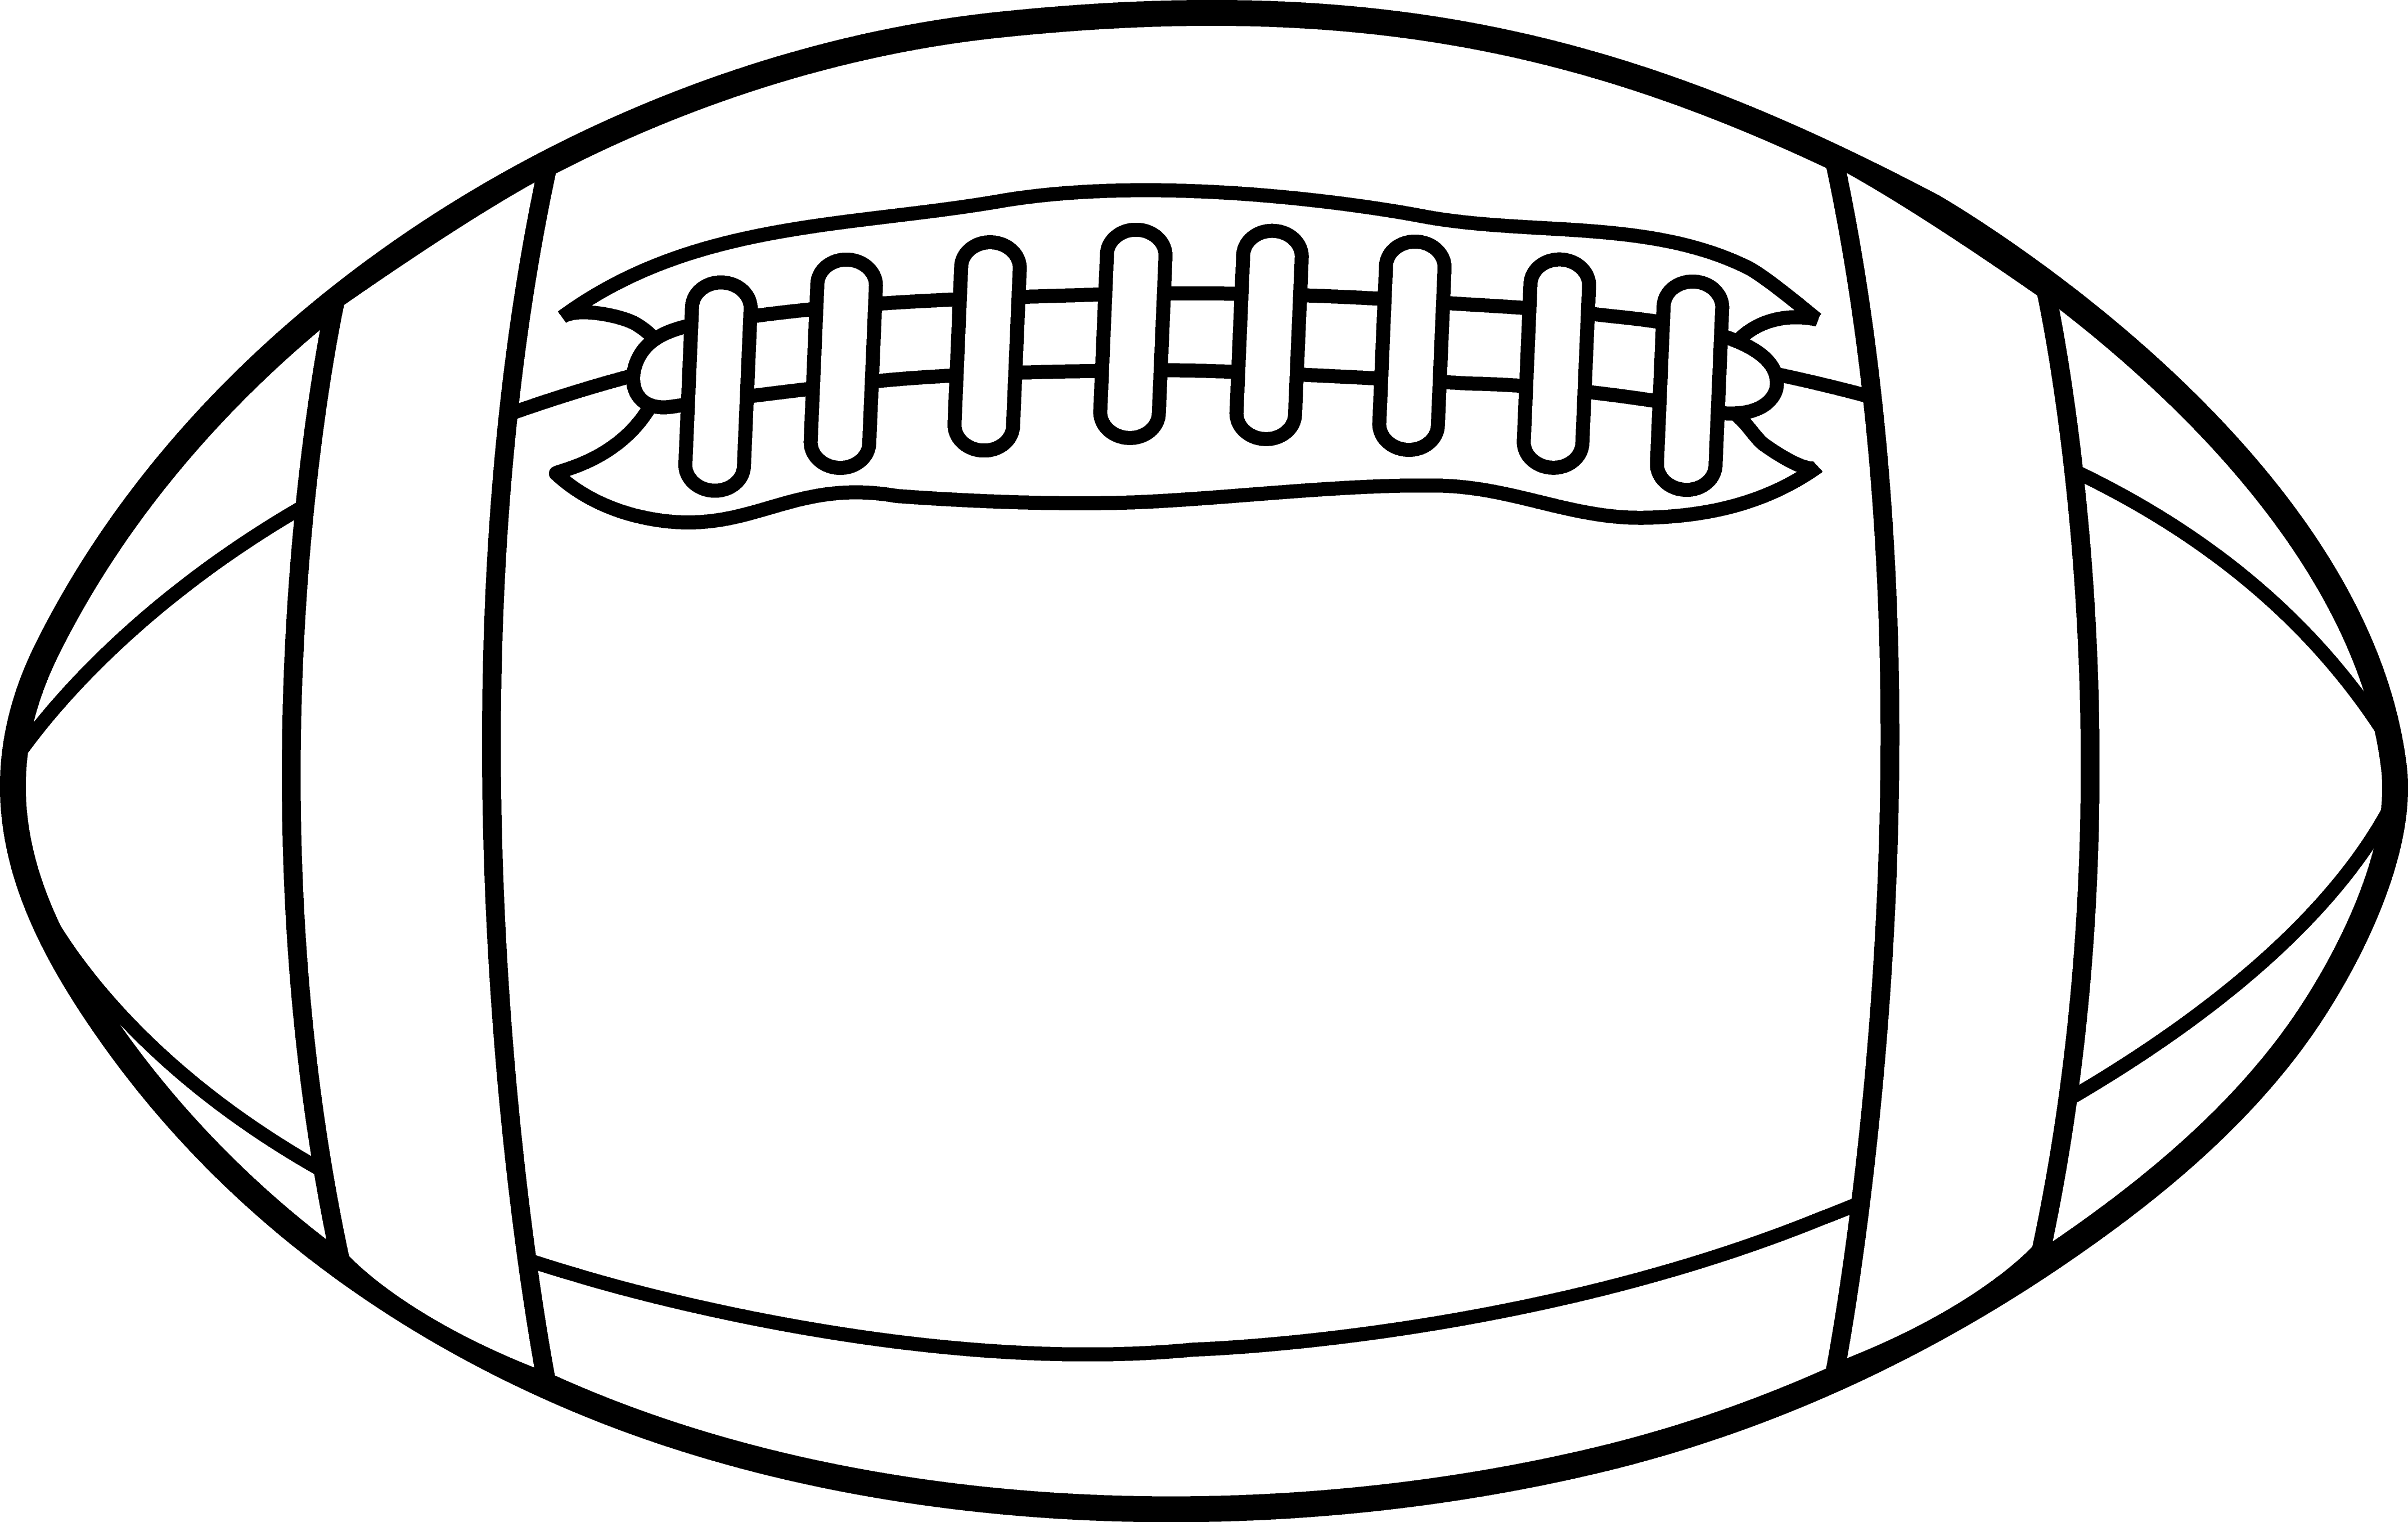 Football word clipart clip library Football outline ball clipart - Hanslodge Cliparts clip library